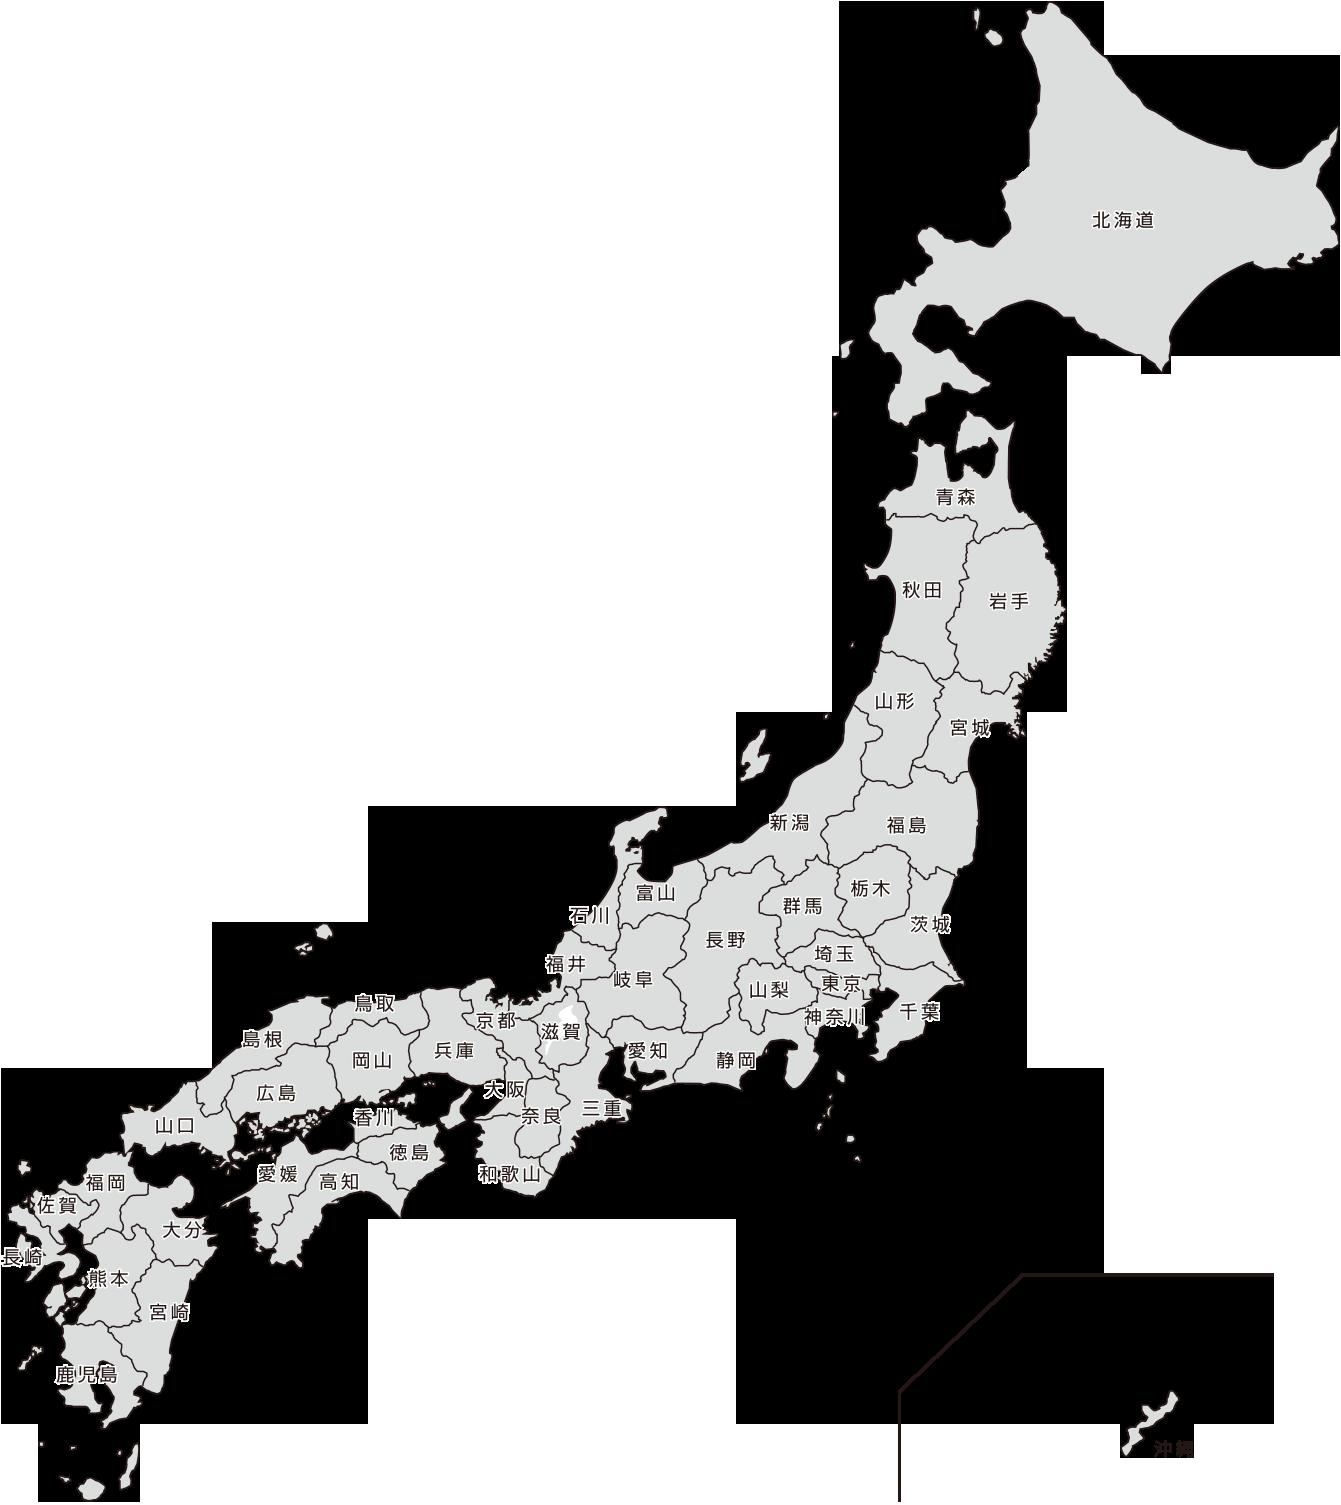 県別表示の日本地図